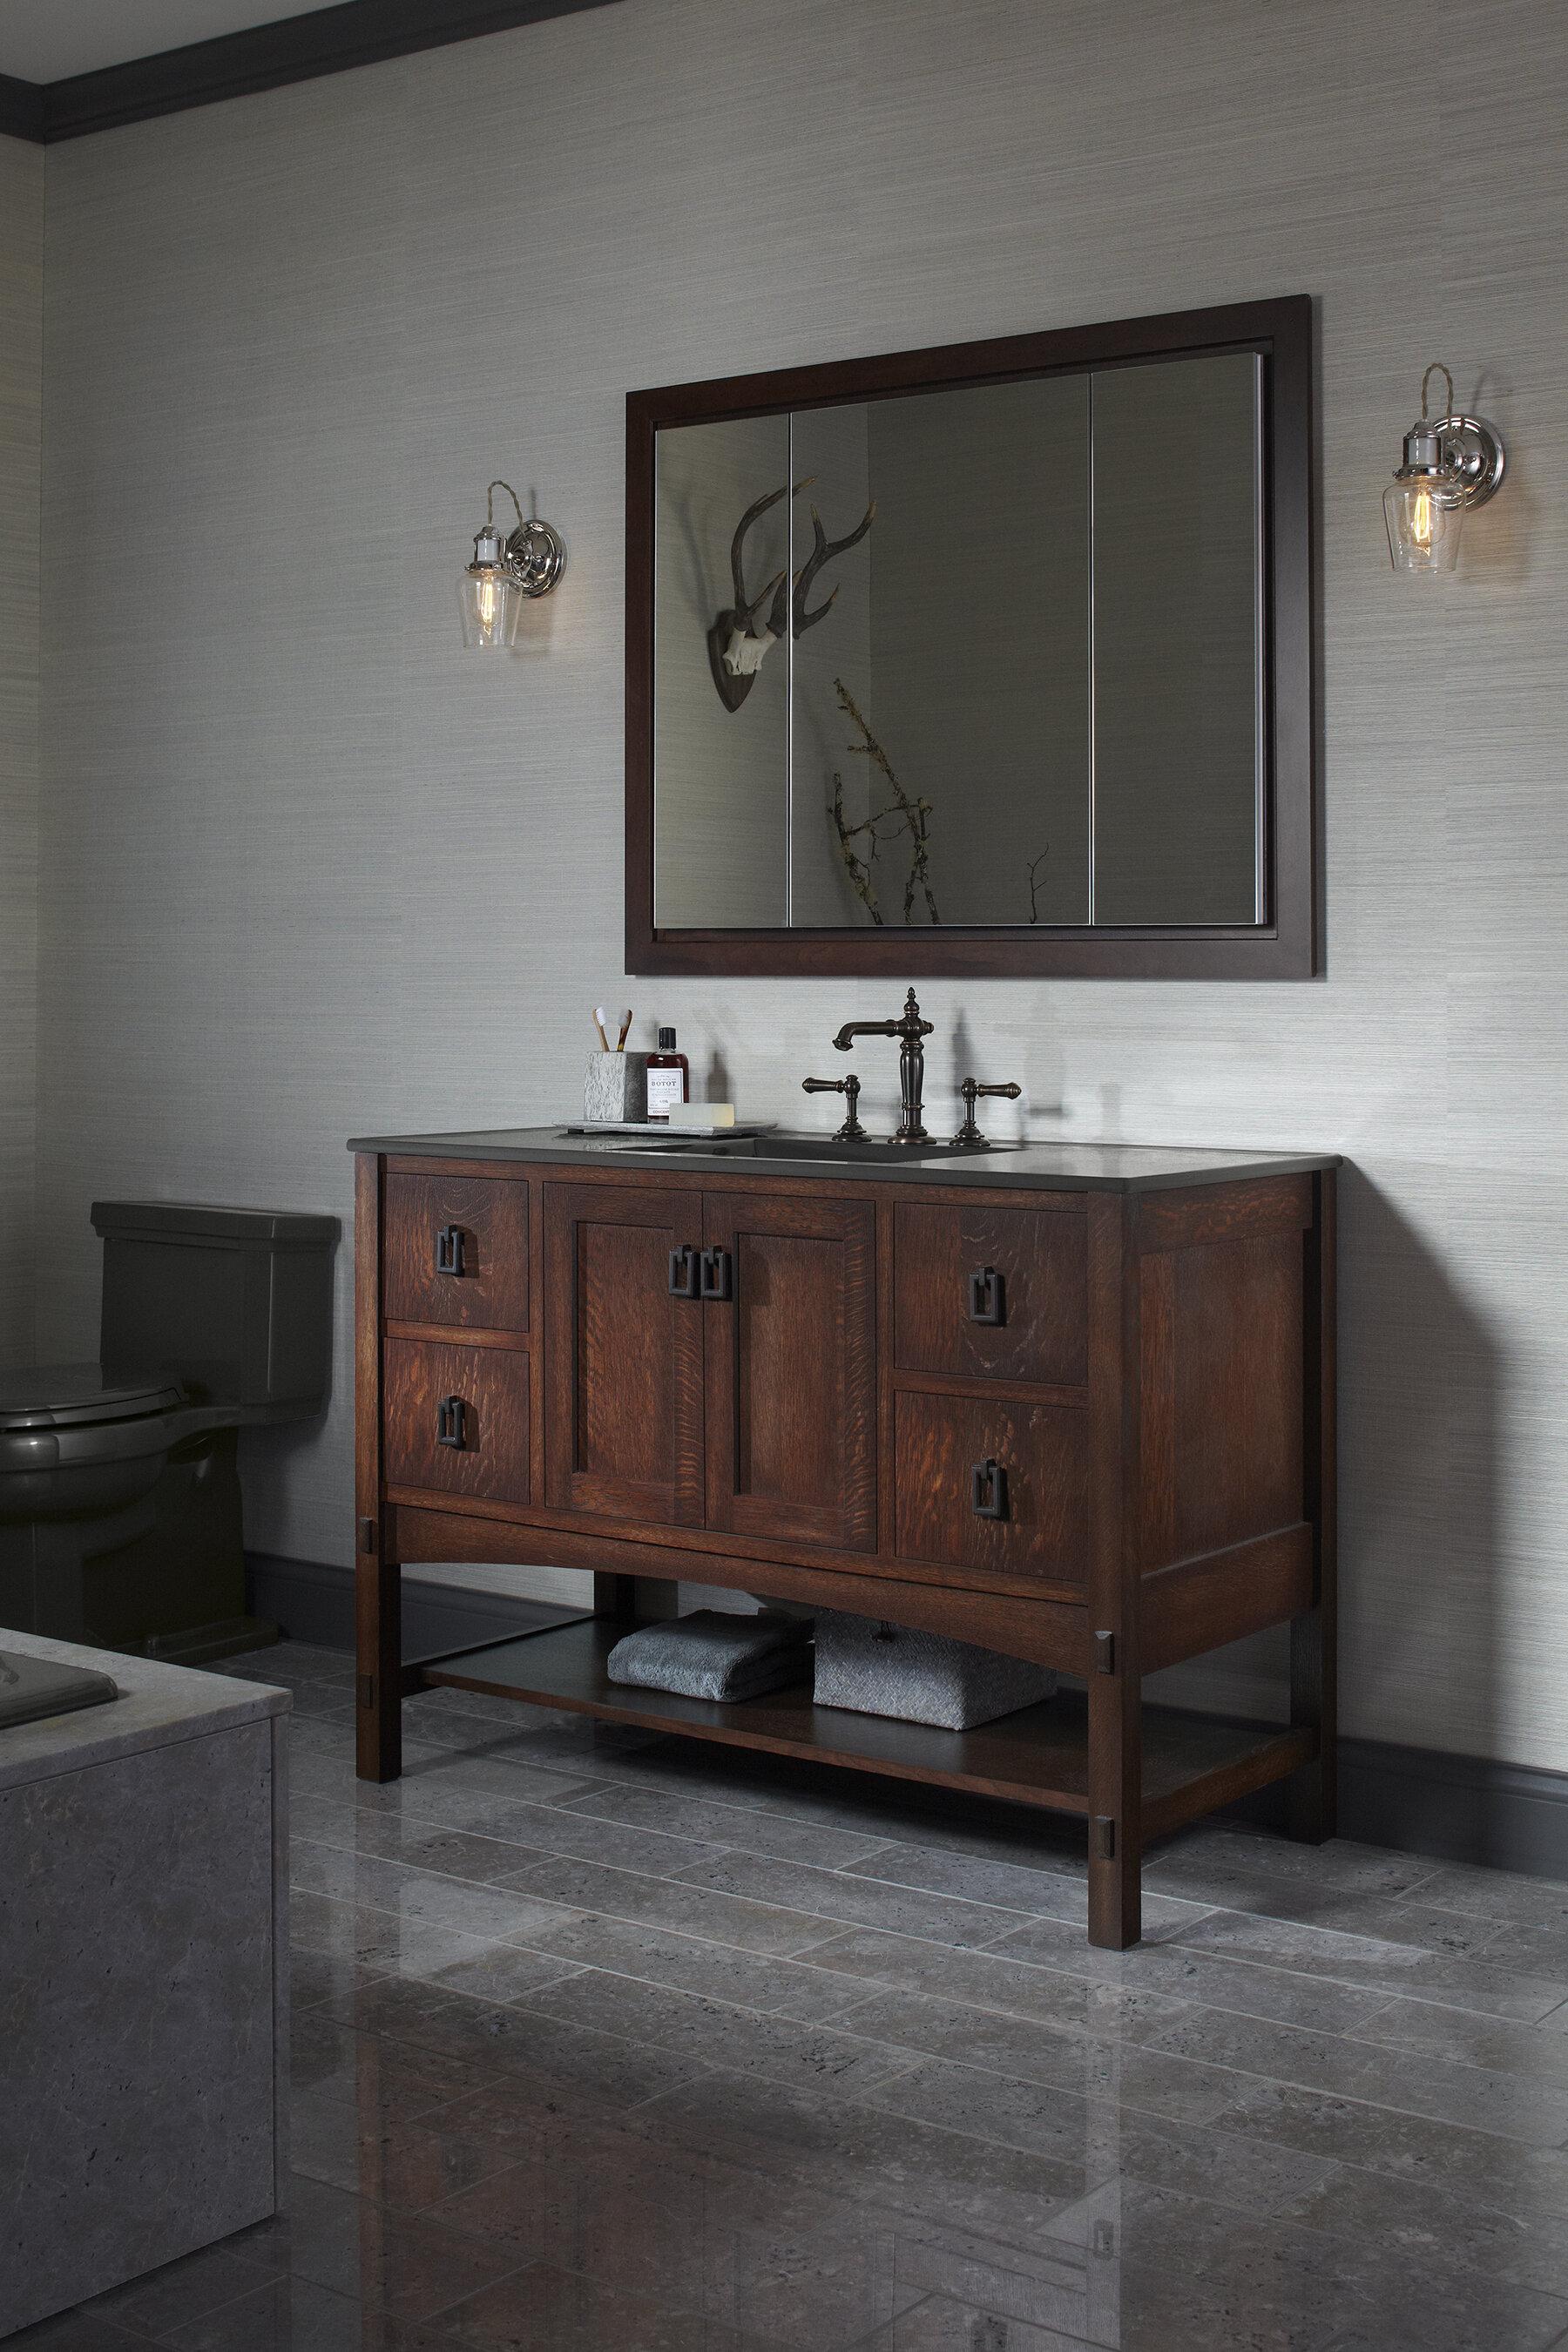 Kohler Verdera 40 X 30 Aluminum Medicine Cabinet With Adjustable Magnifying Mirror And Slow Close Door Reviews Wayfair Ca